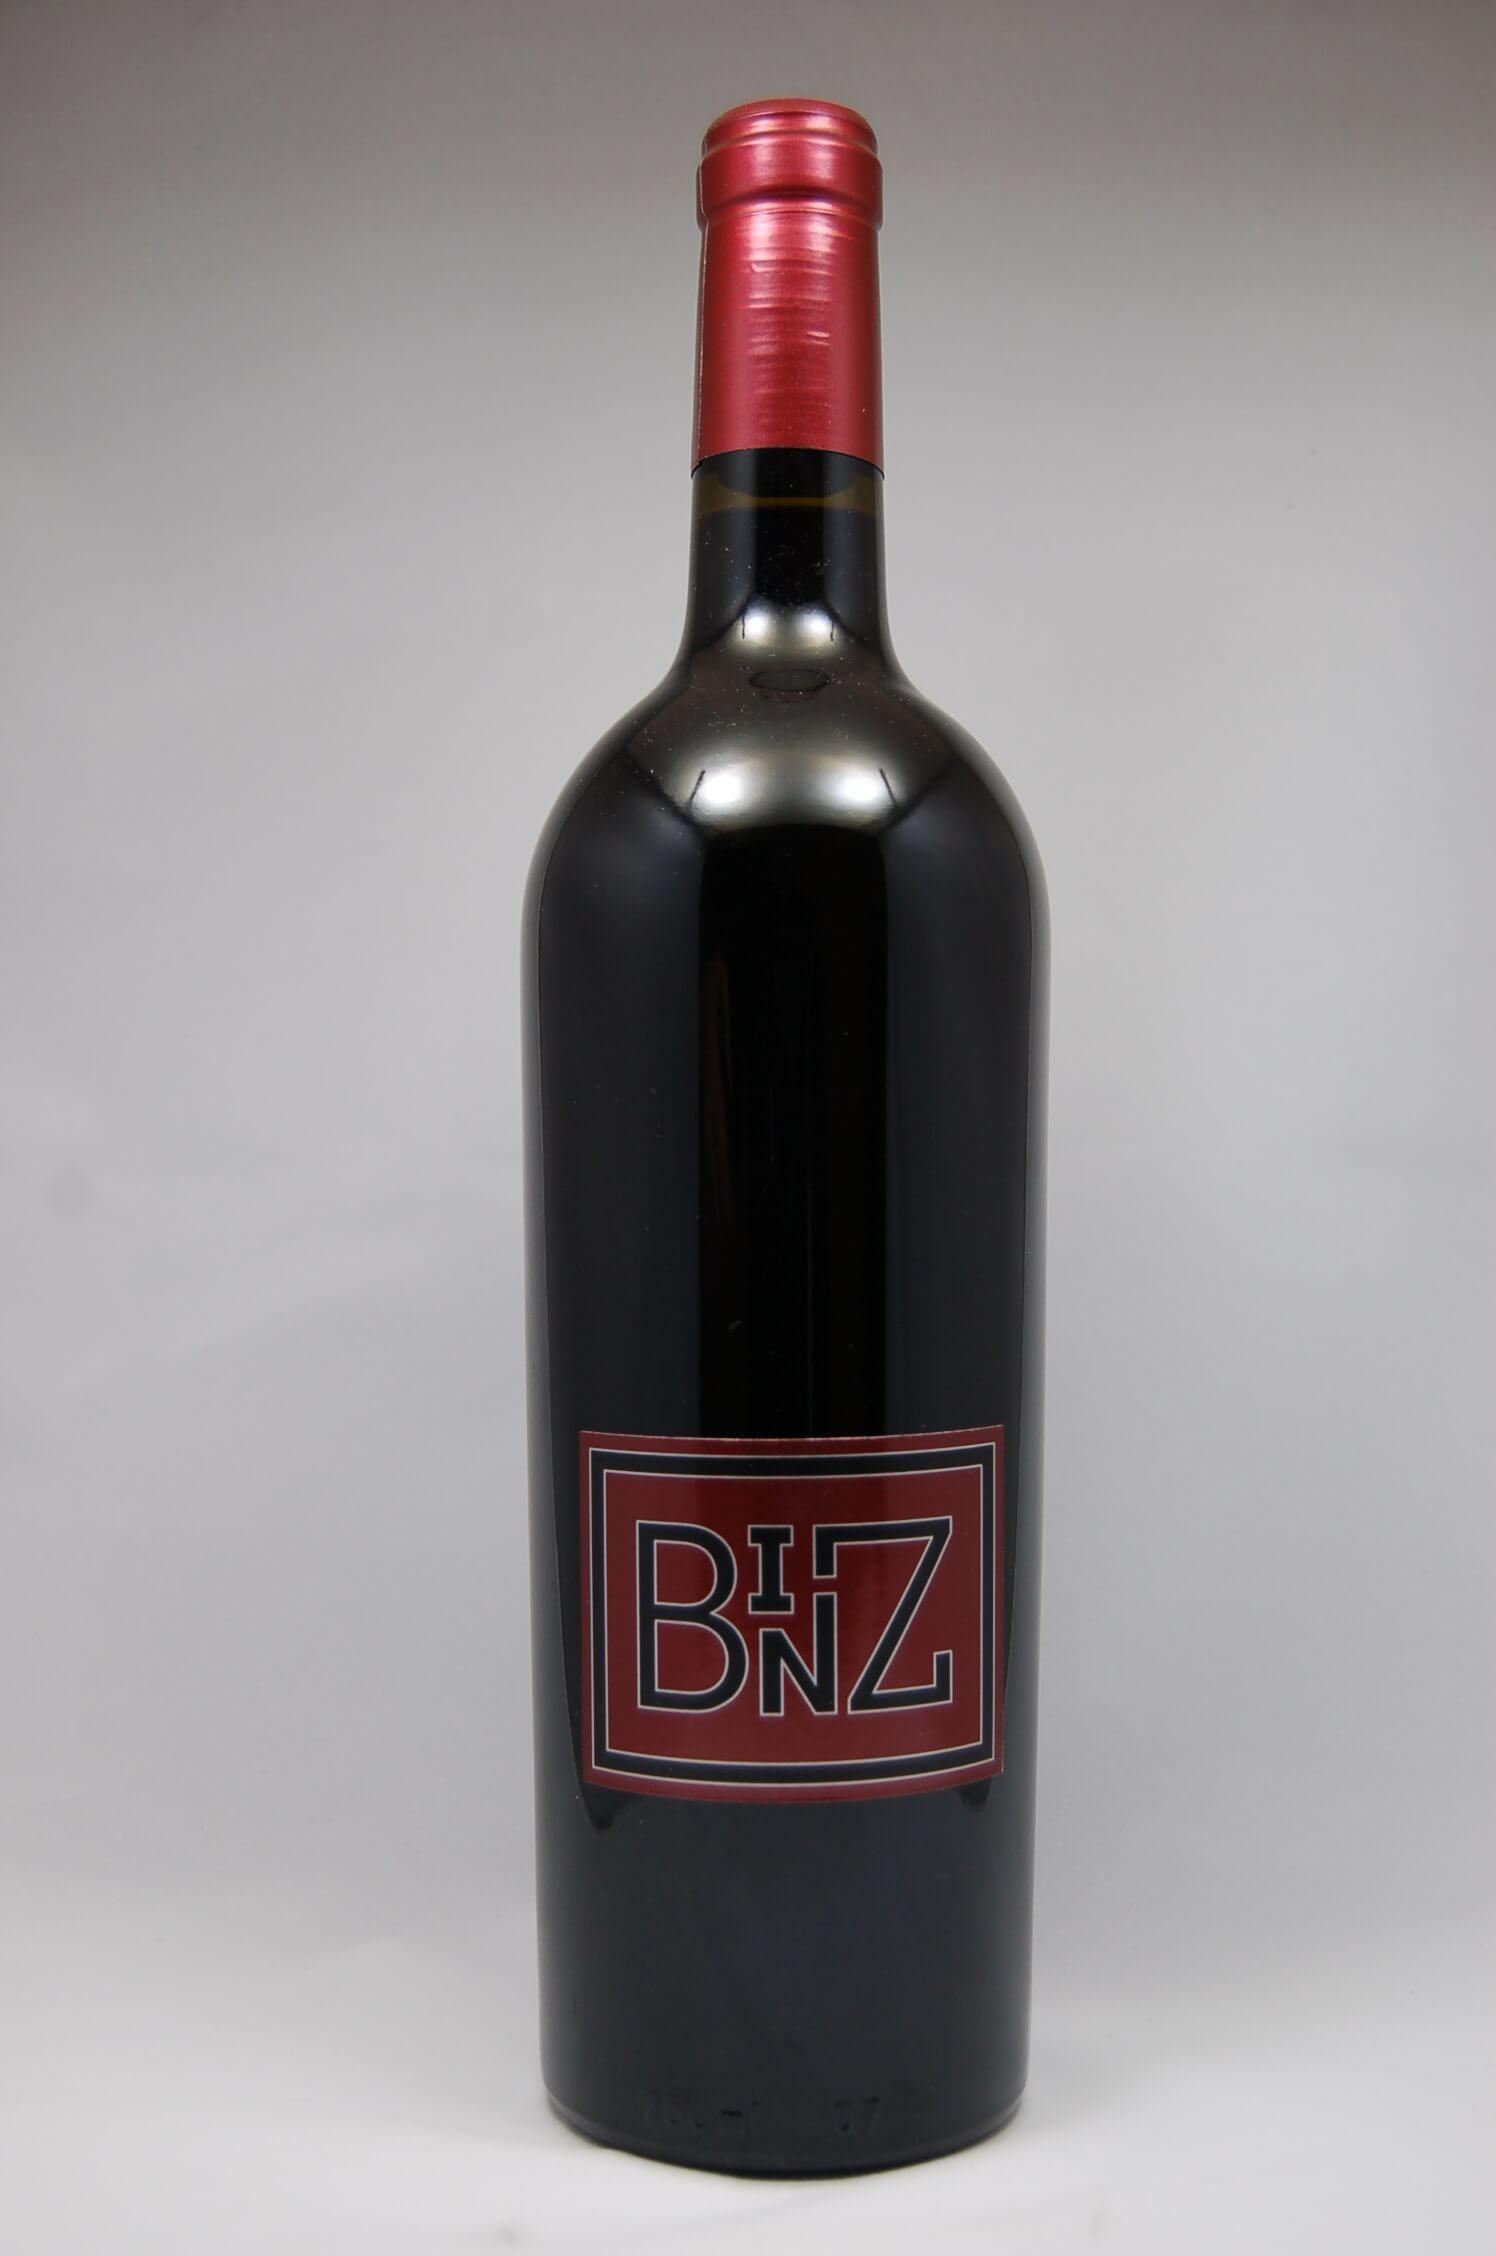 Binz Cabernet Franc 2013